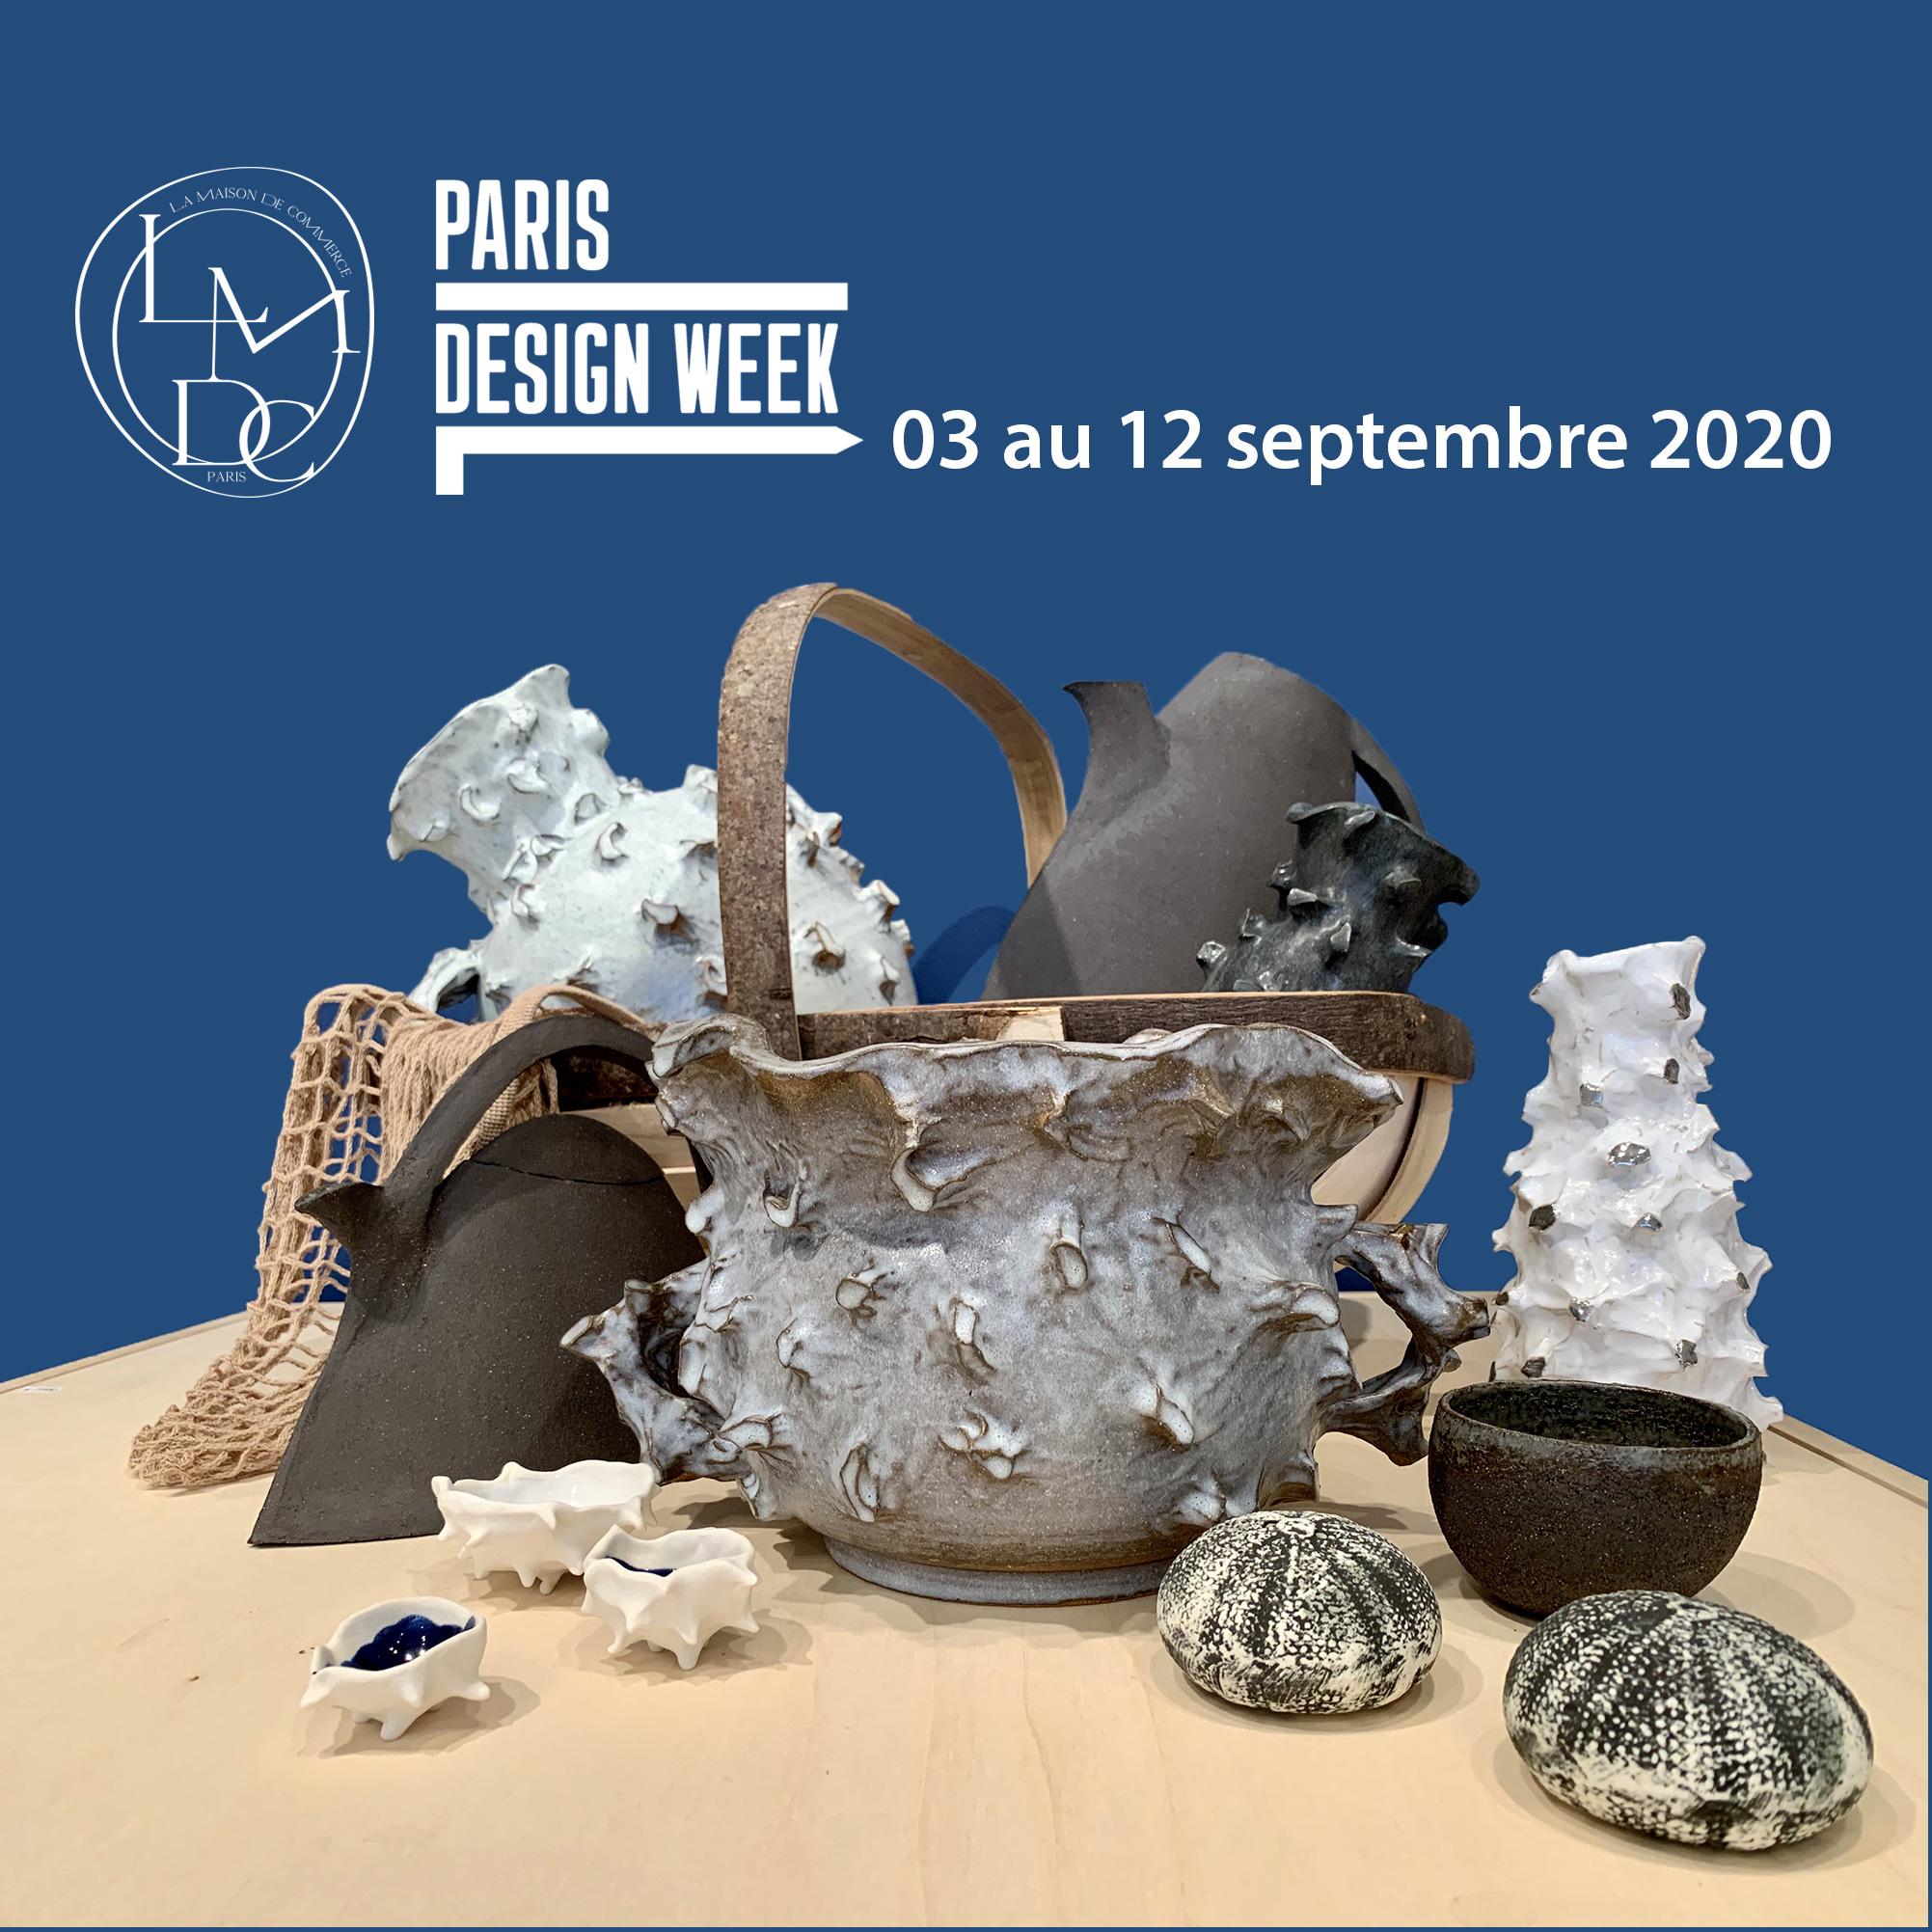 Paris Design Week 2020 - Ana Belen Castillo - céramiste